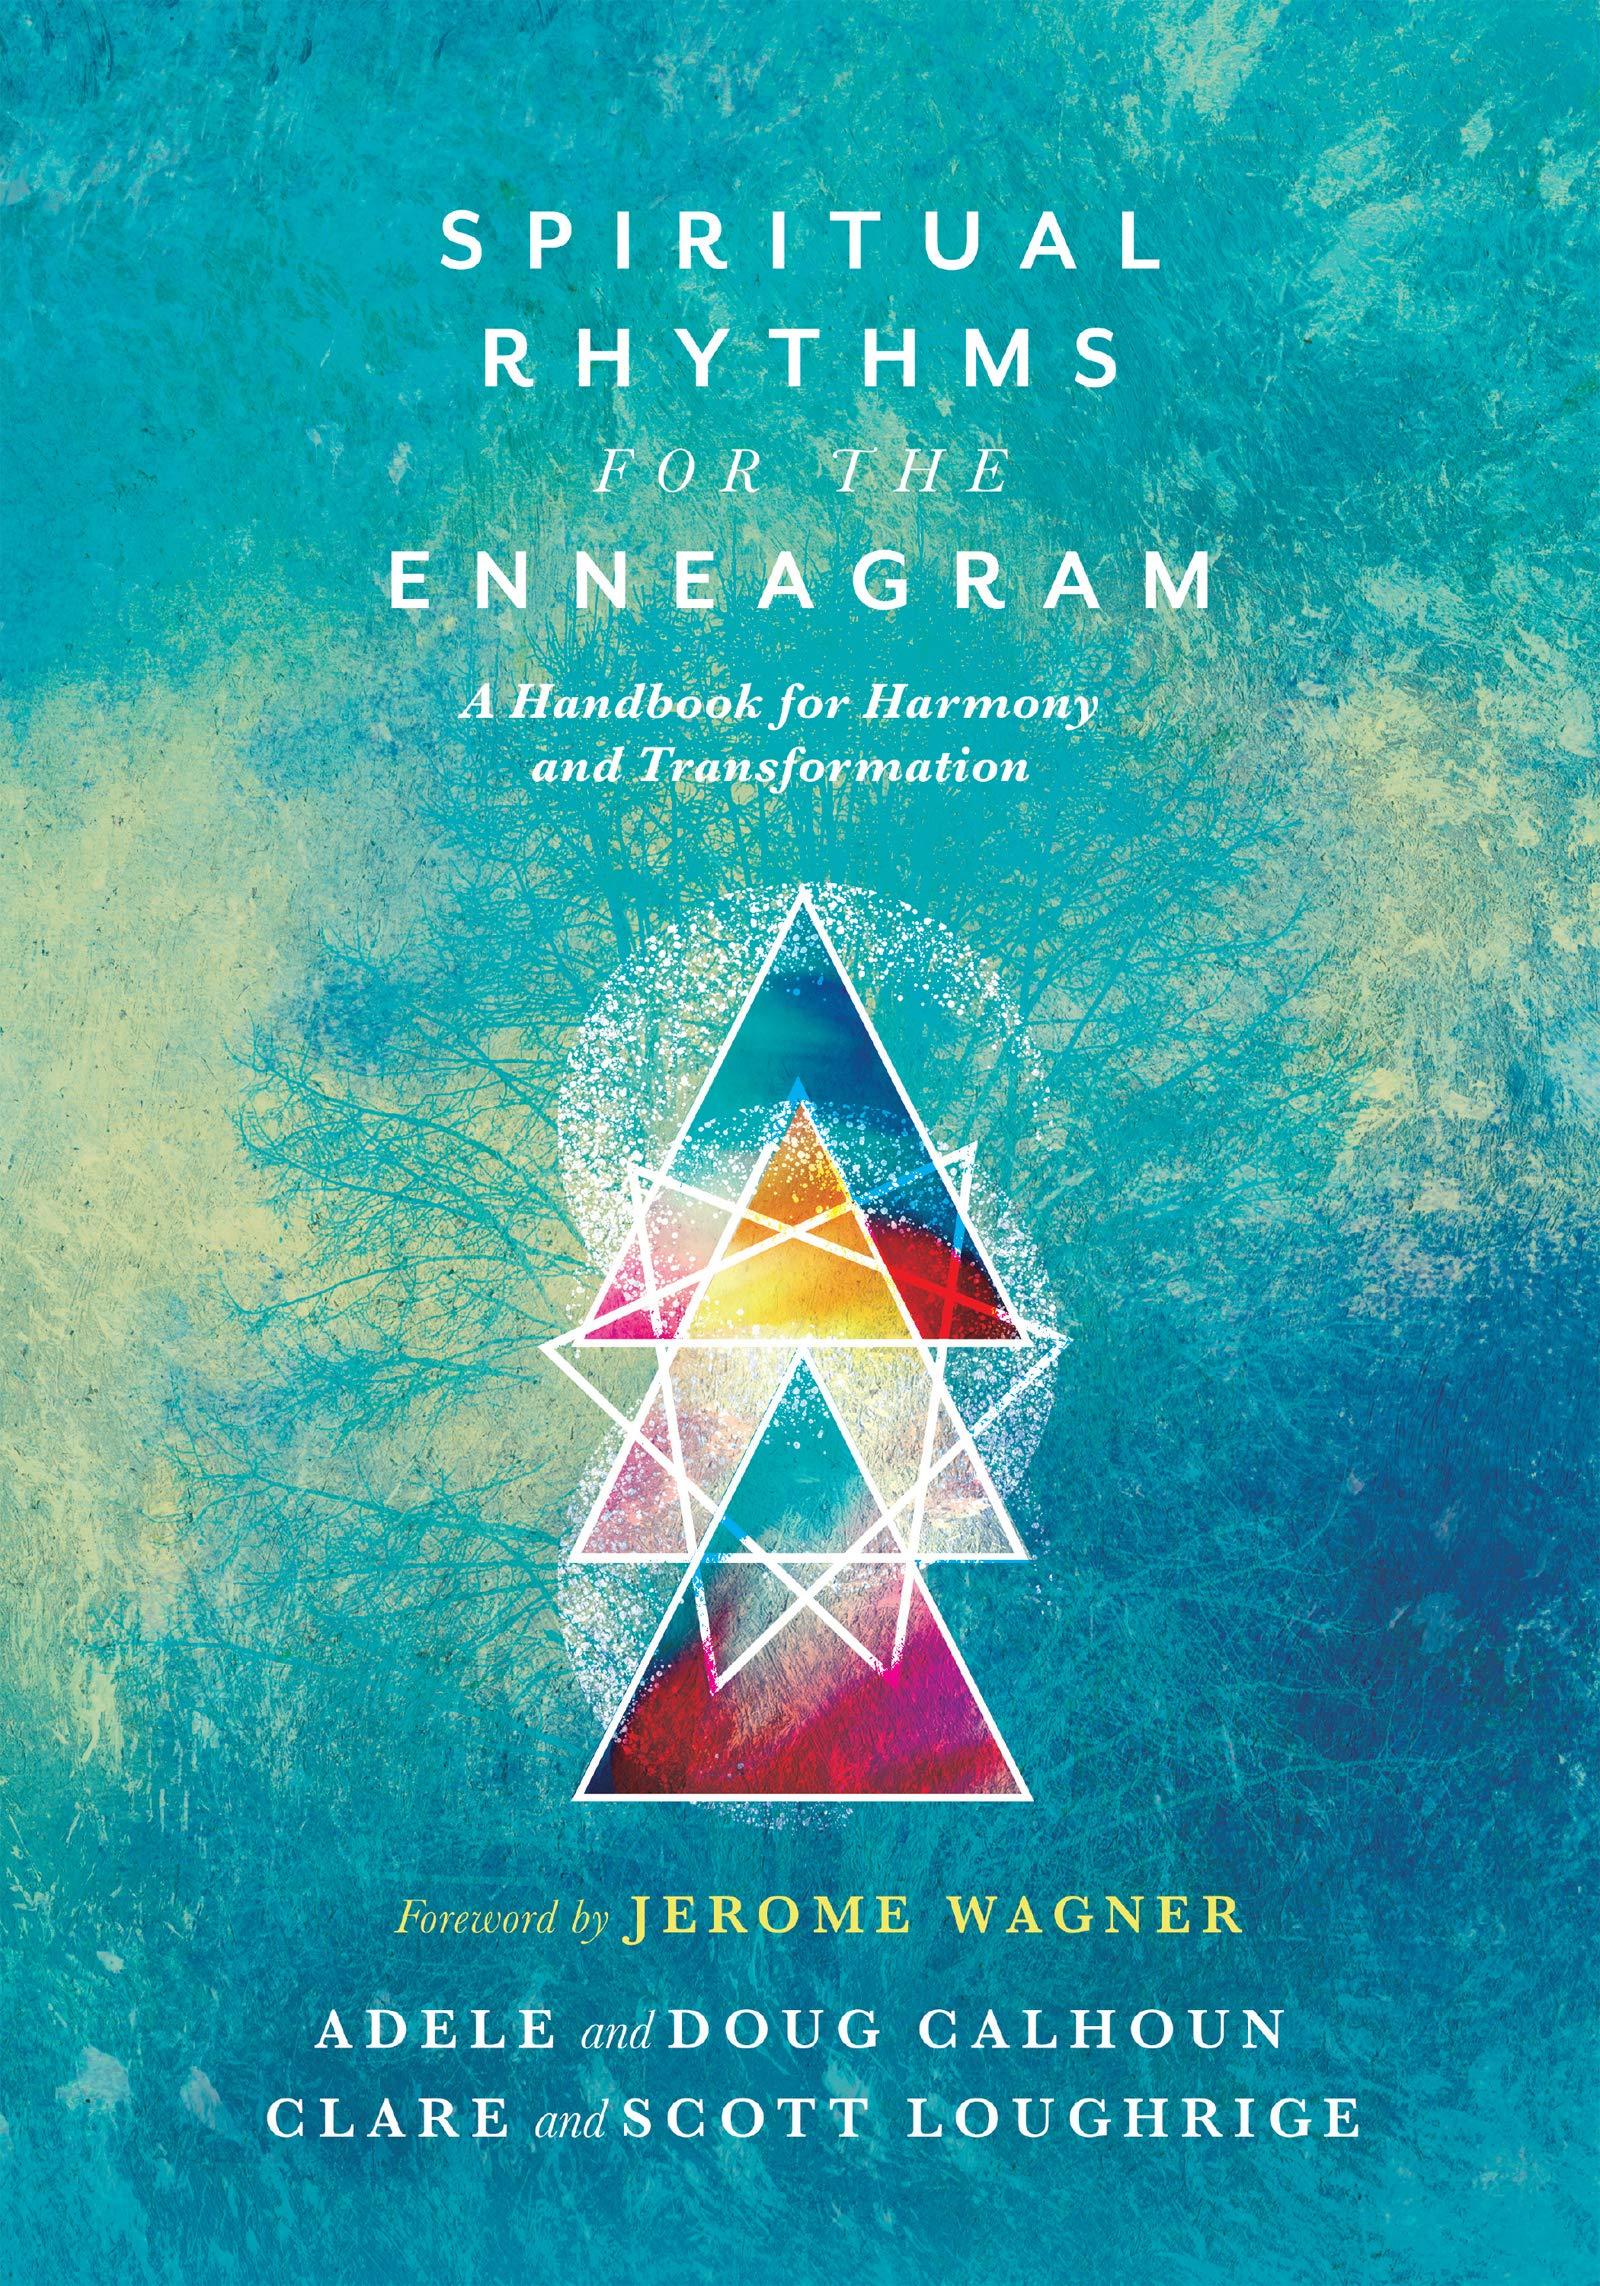 Spiritual Rhythms for the Enneagram: A Handbook for Harmony and Transformation by InterVarsity Press